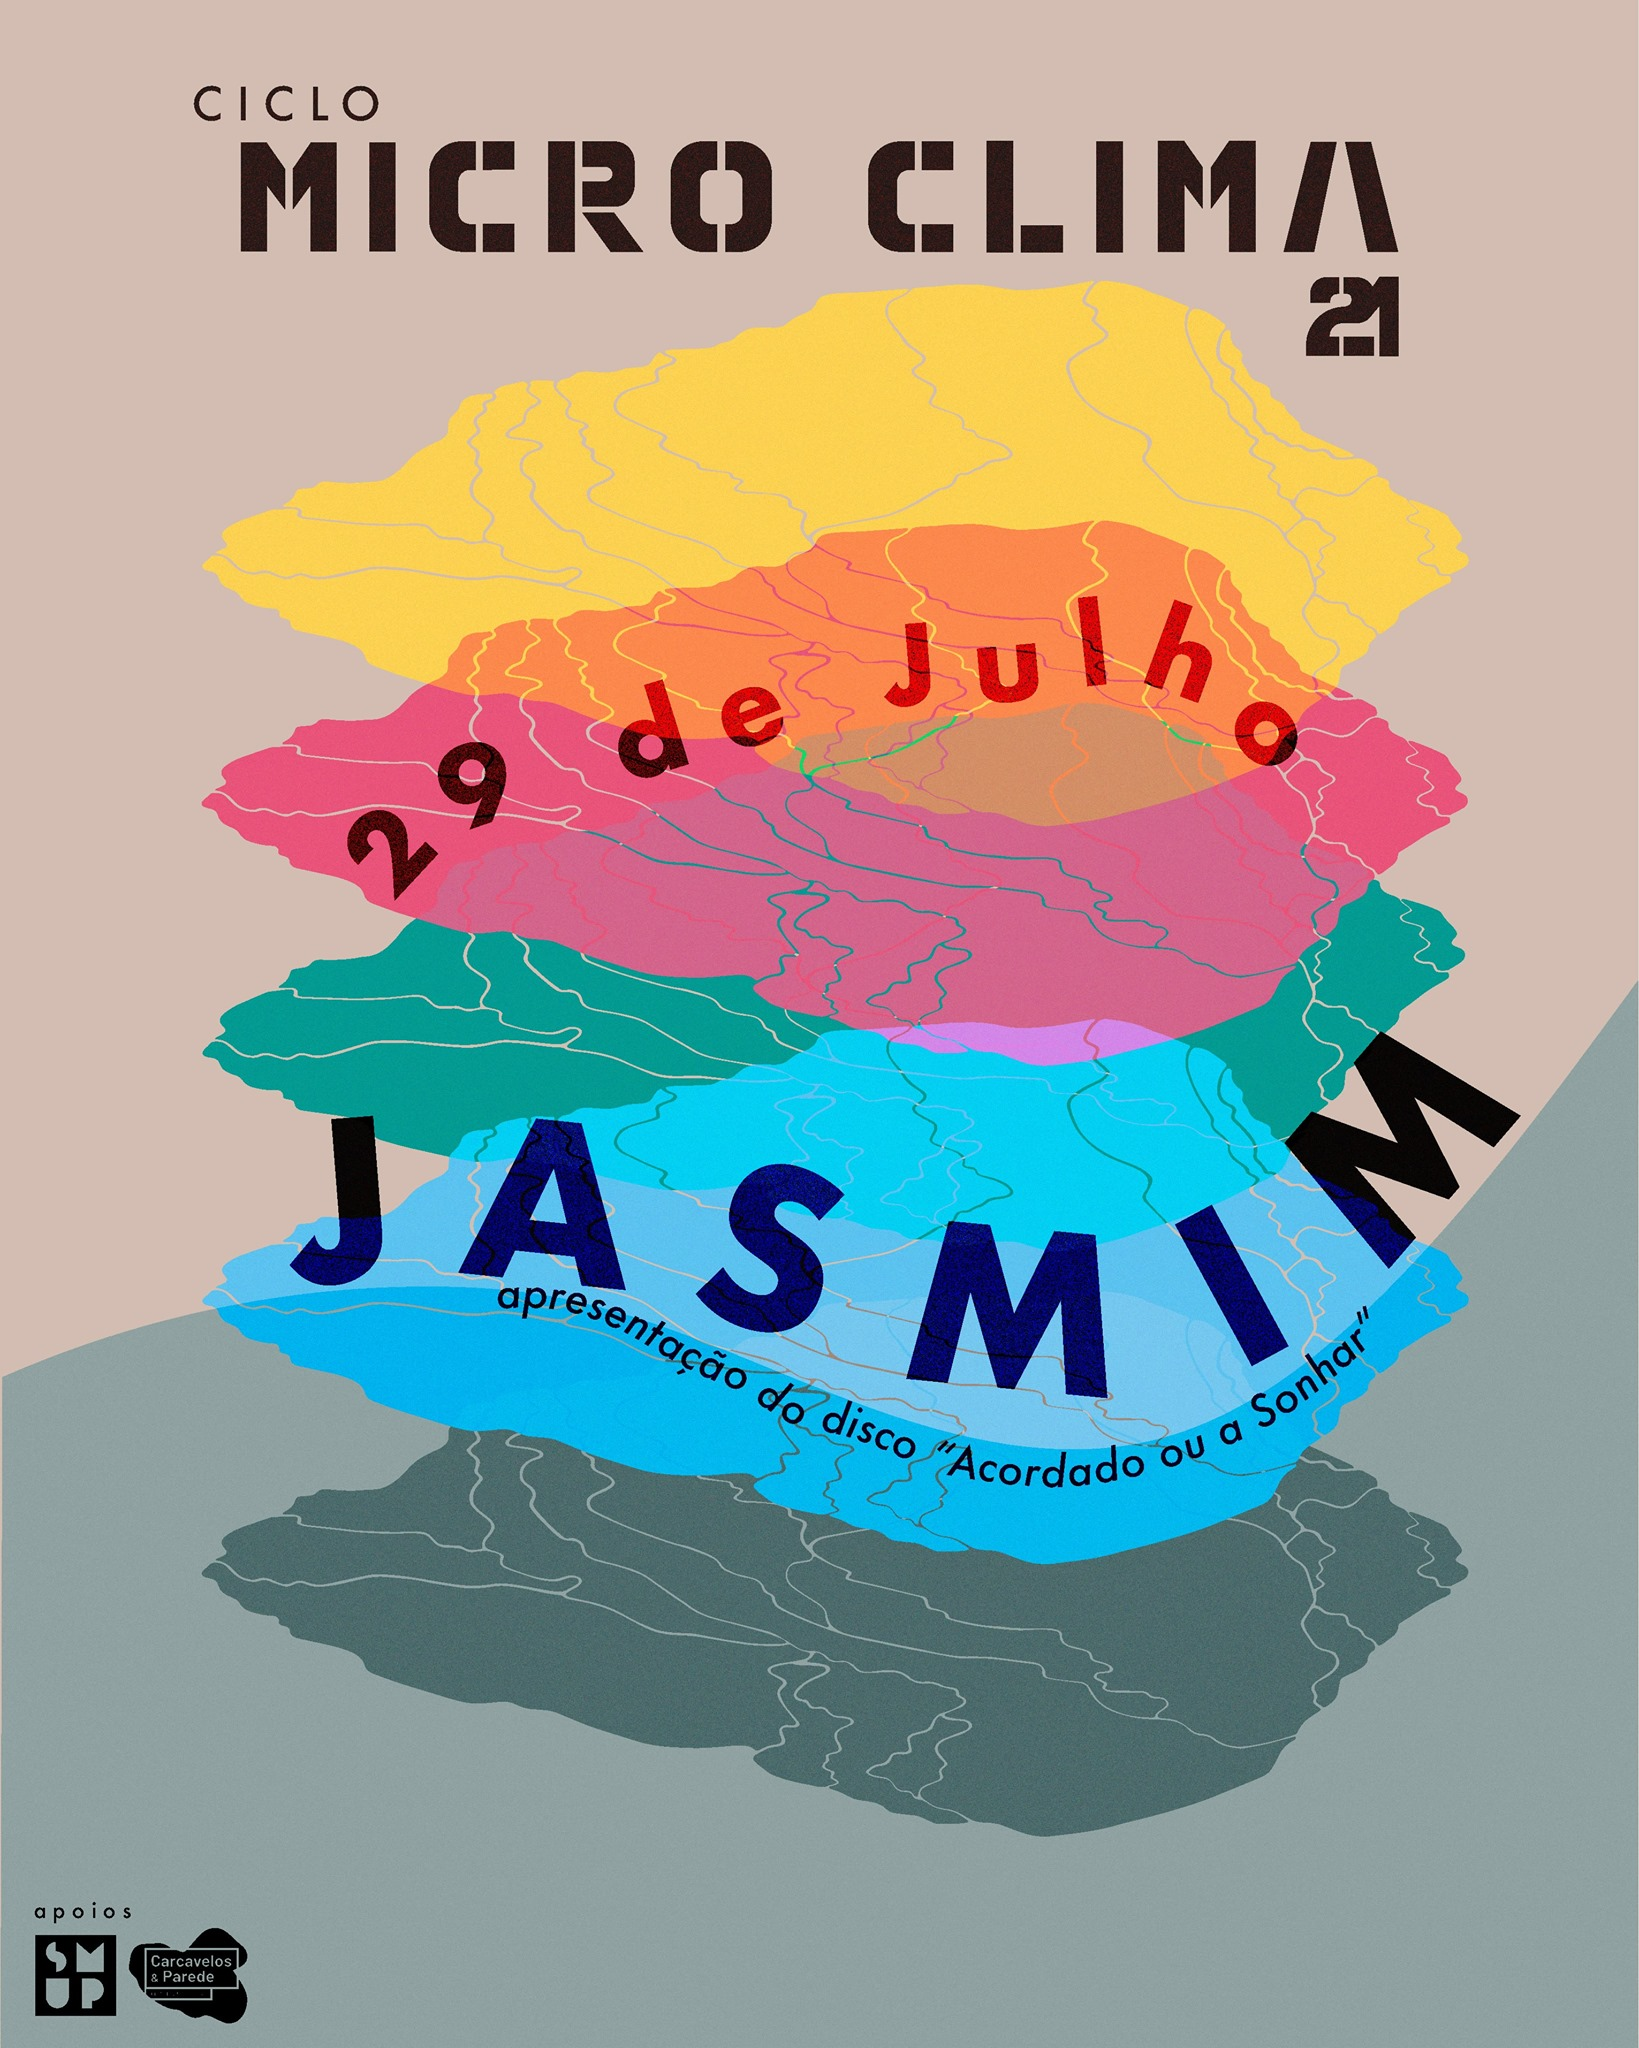 Ciclo Micro Clima - Jasmim